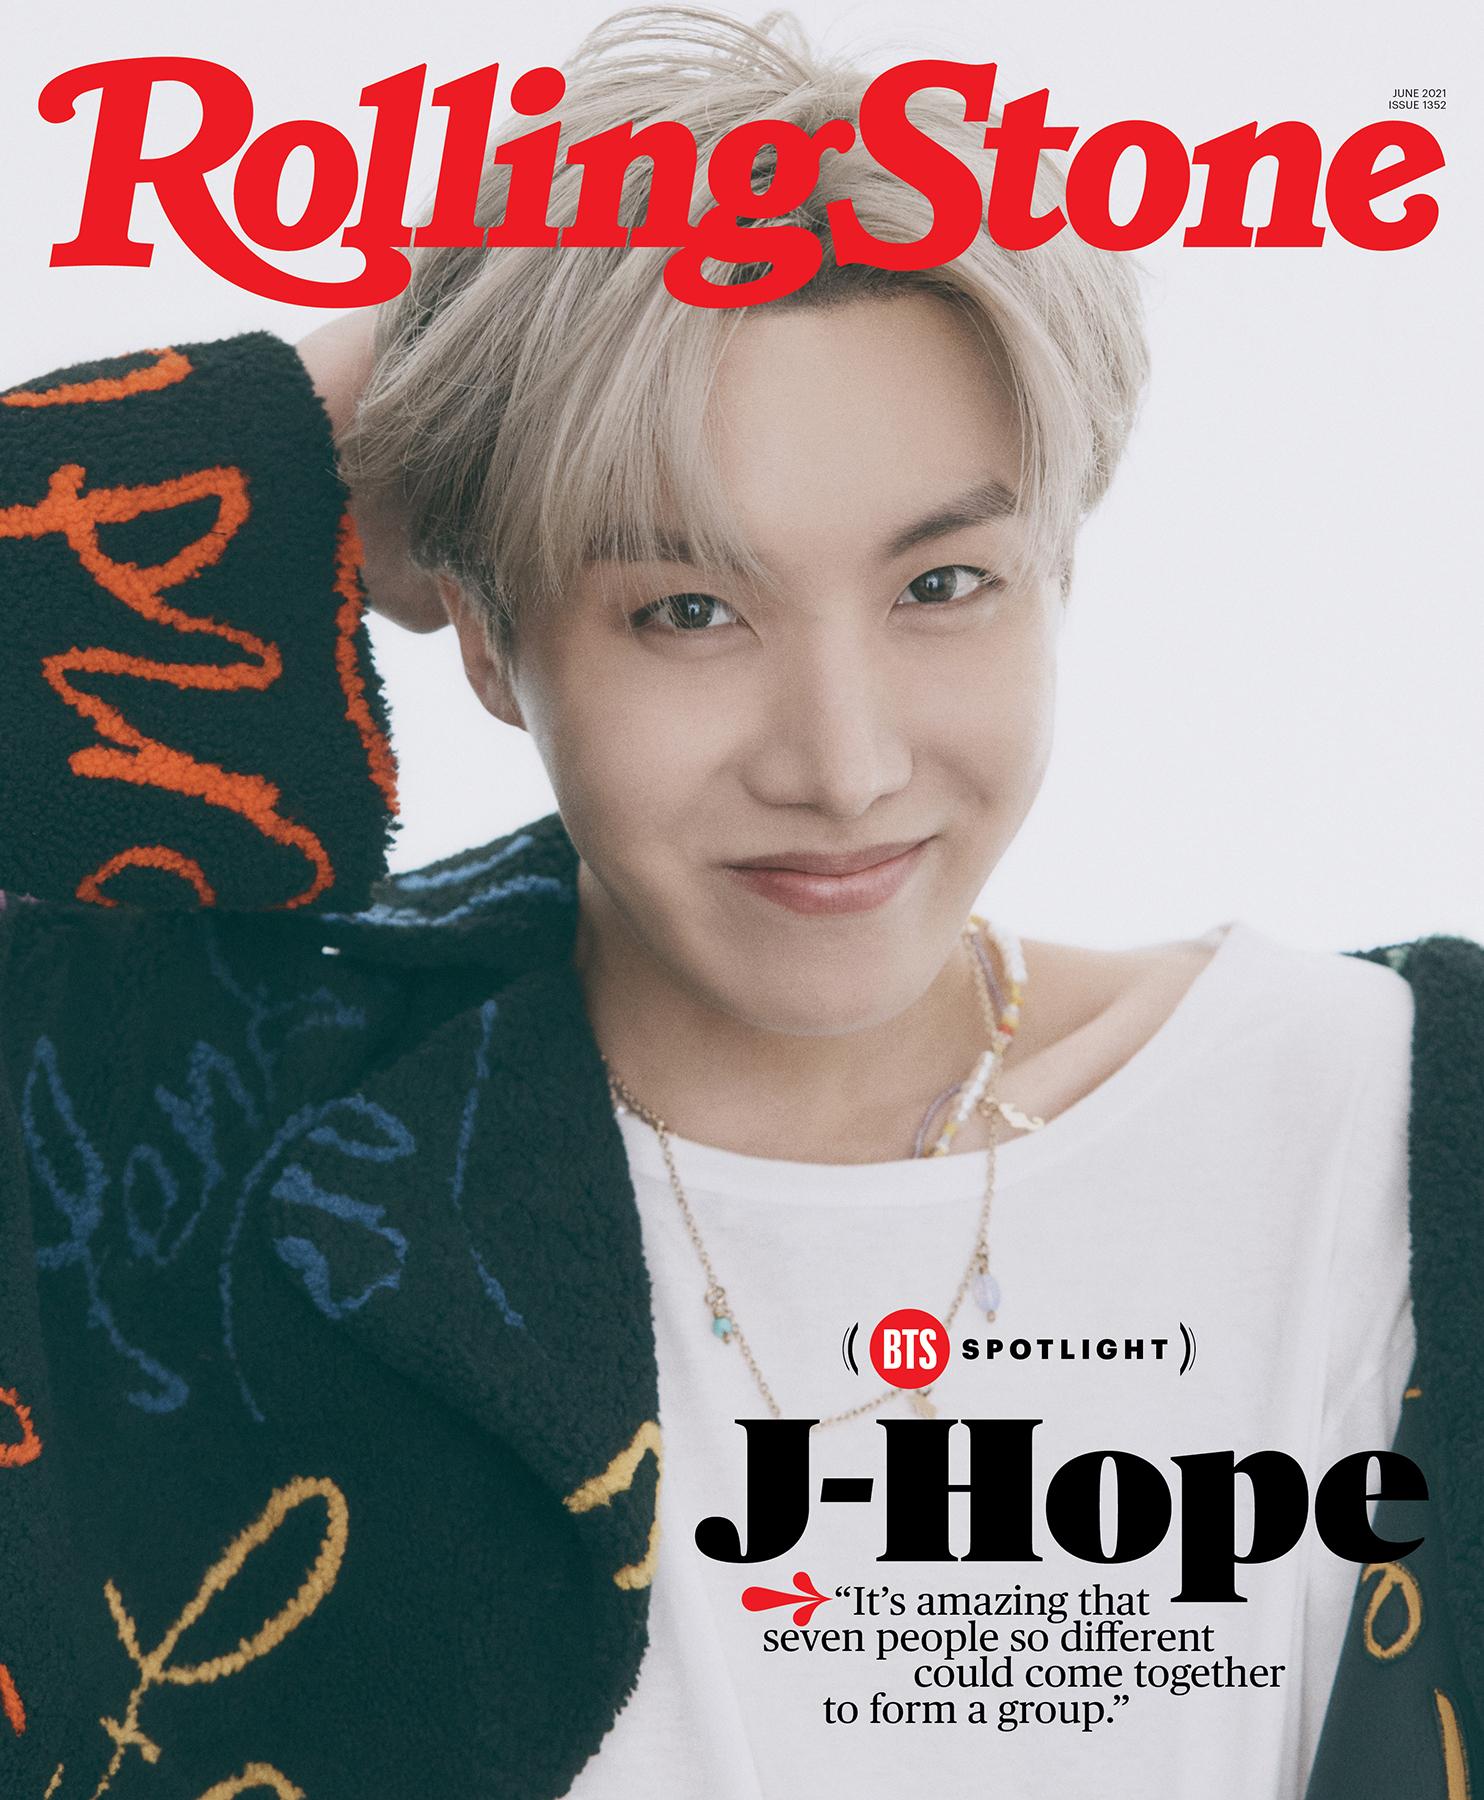 rs digital cover bts bangtan boys big hit j-hope